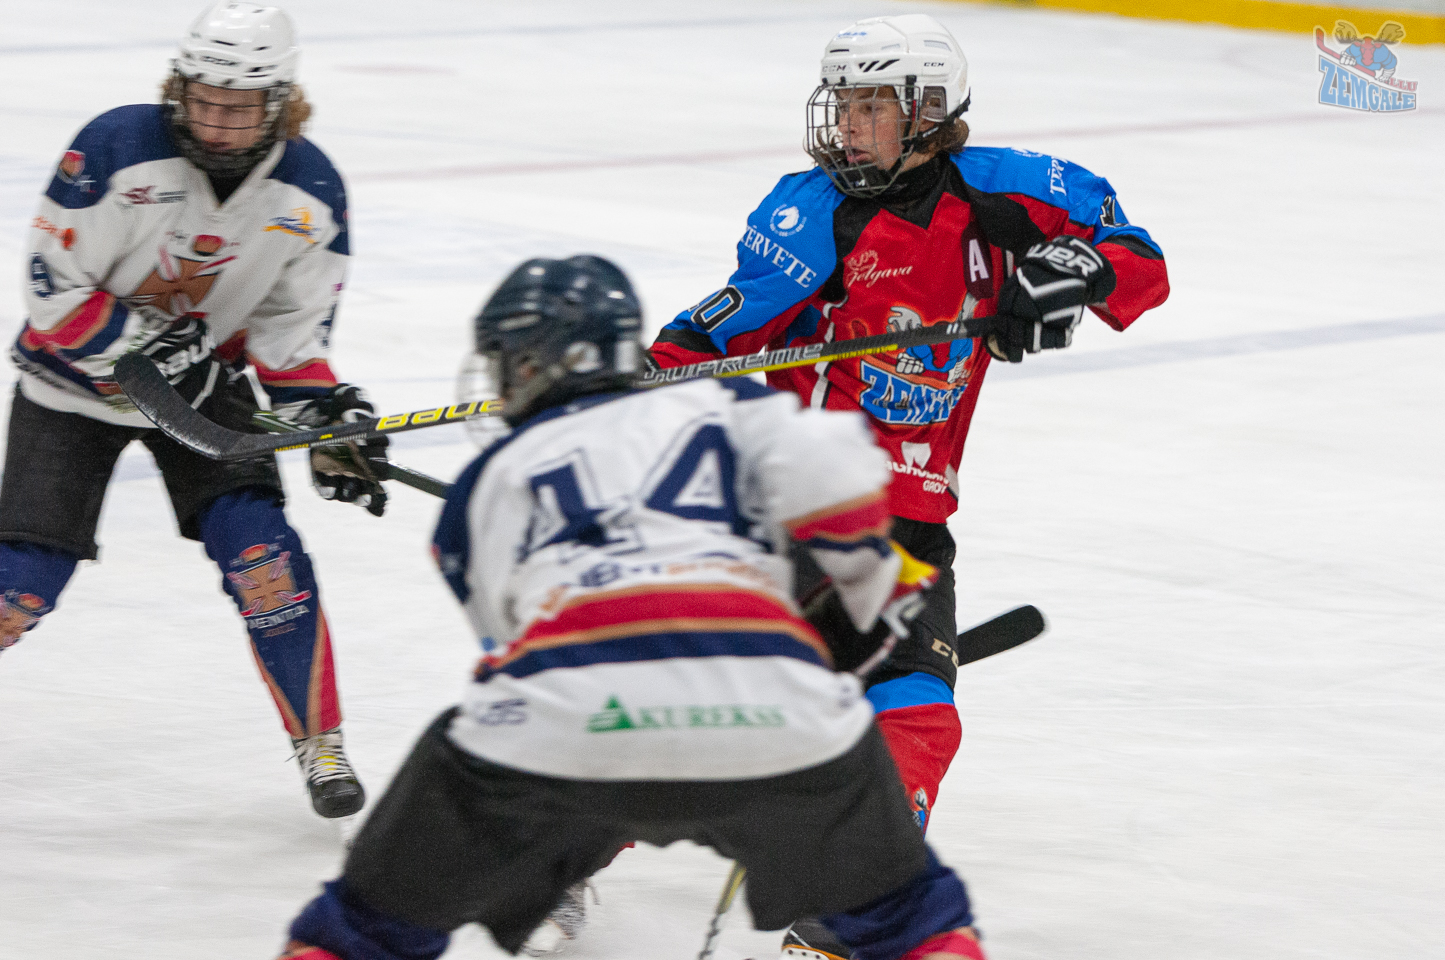 Jelgavas hokeja skola JLSS U17 - Venta 2002 14092019-23